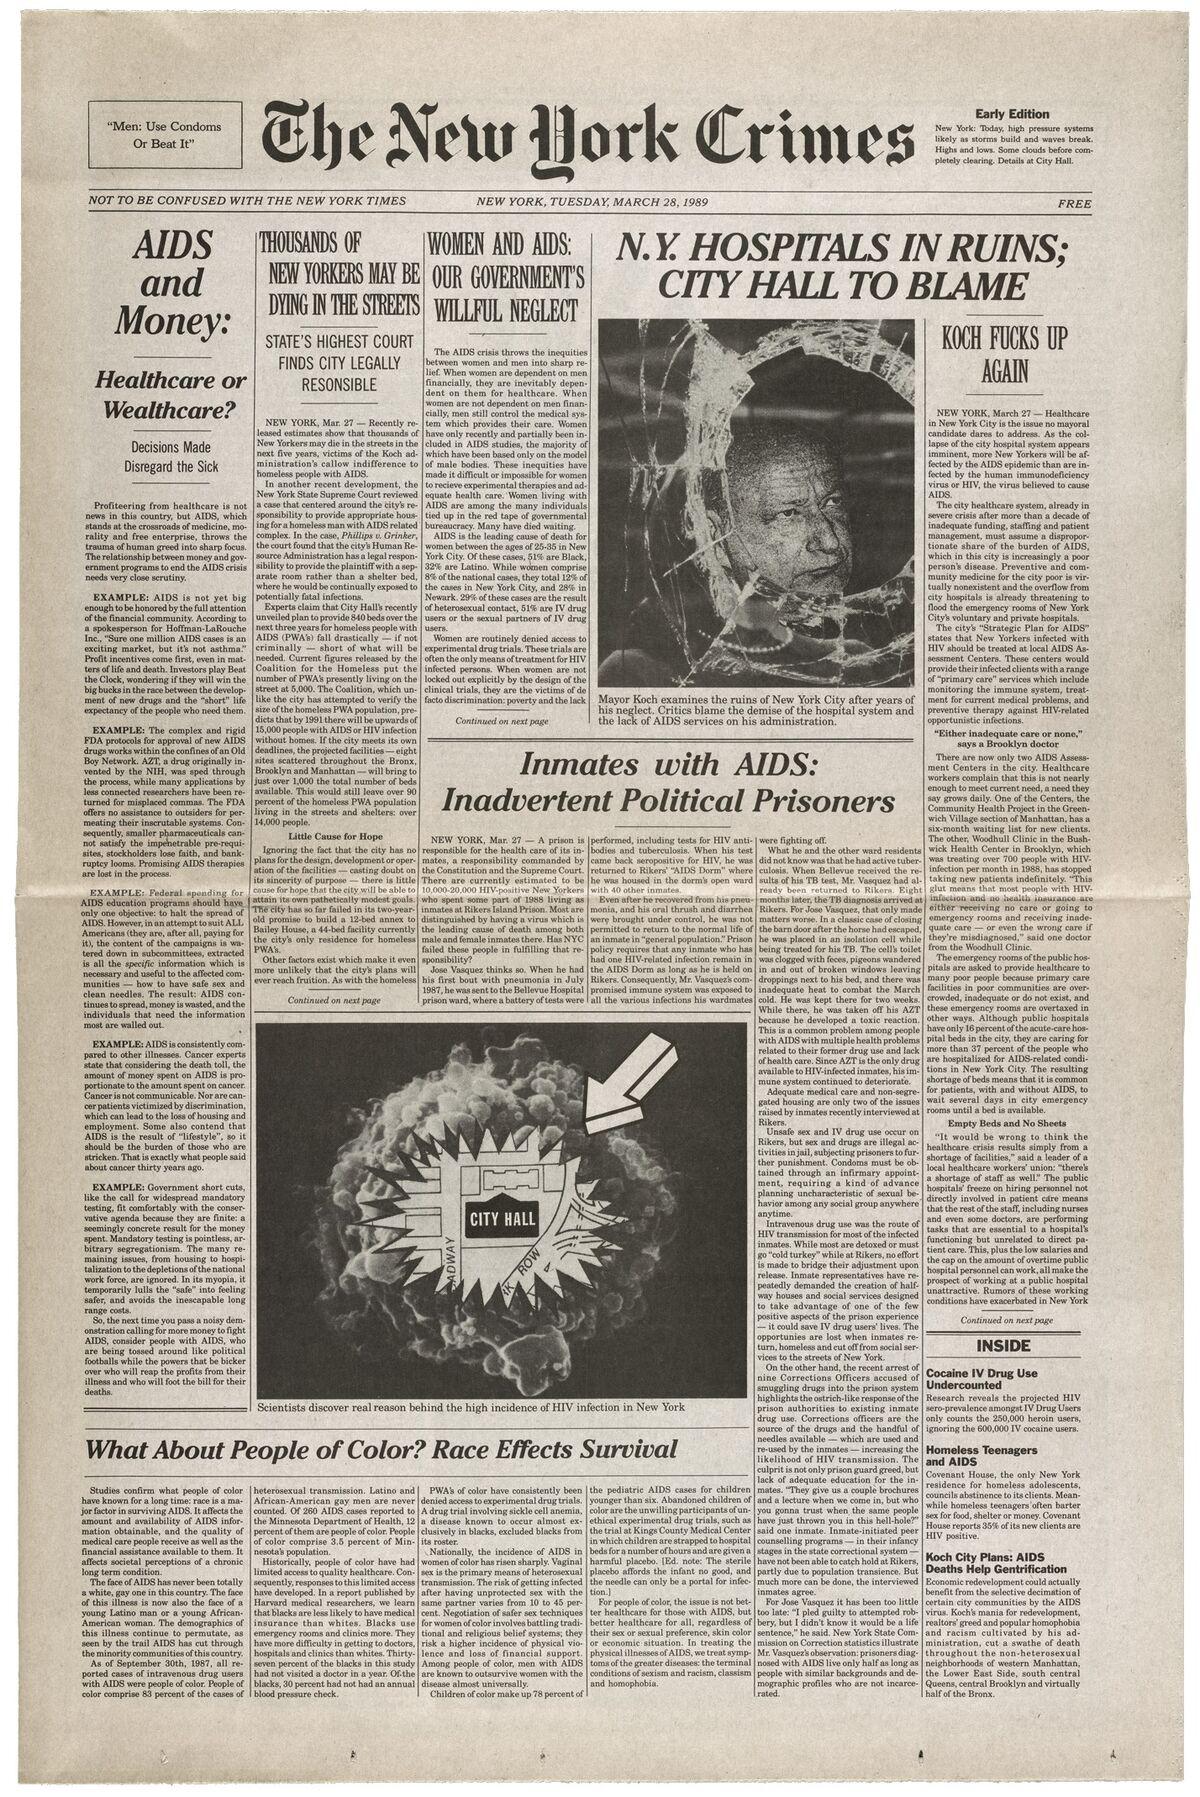 Gran Fury, New York Crimes, 1989. Courtesy of Avram Finkelstein and the Flag Art Foundation.